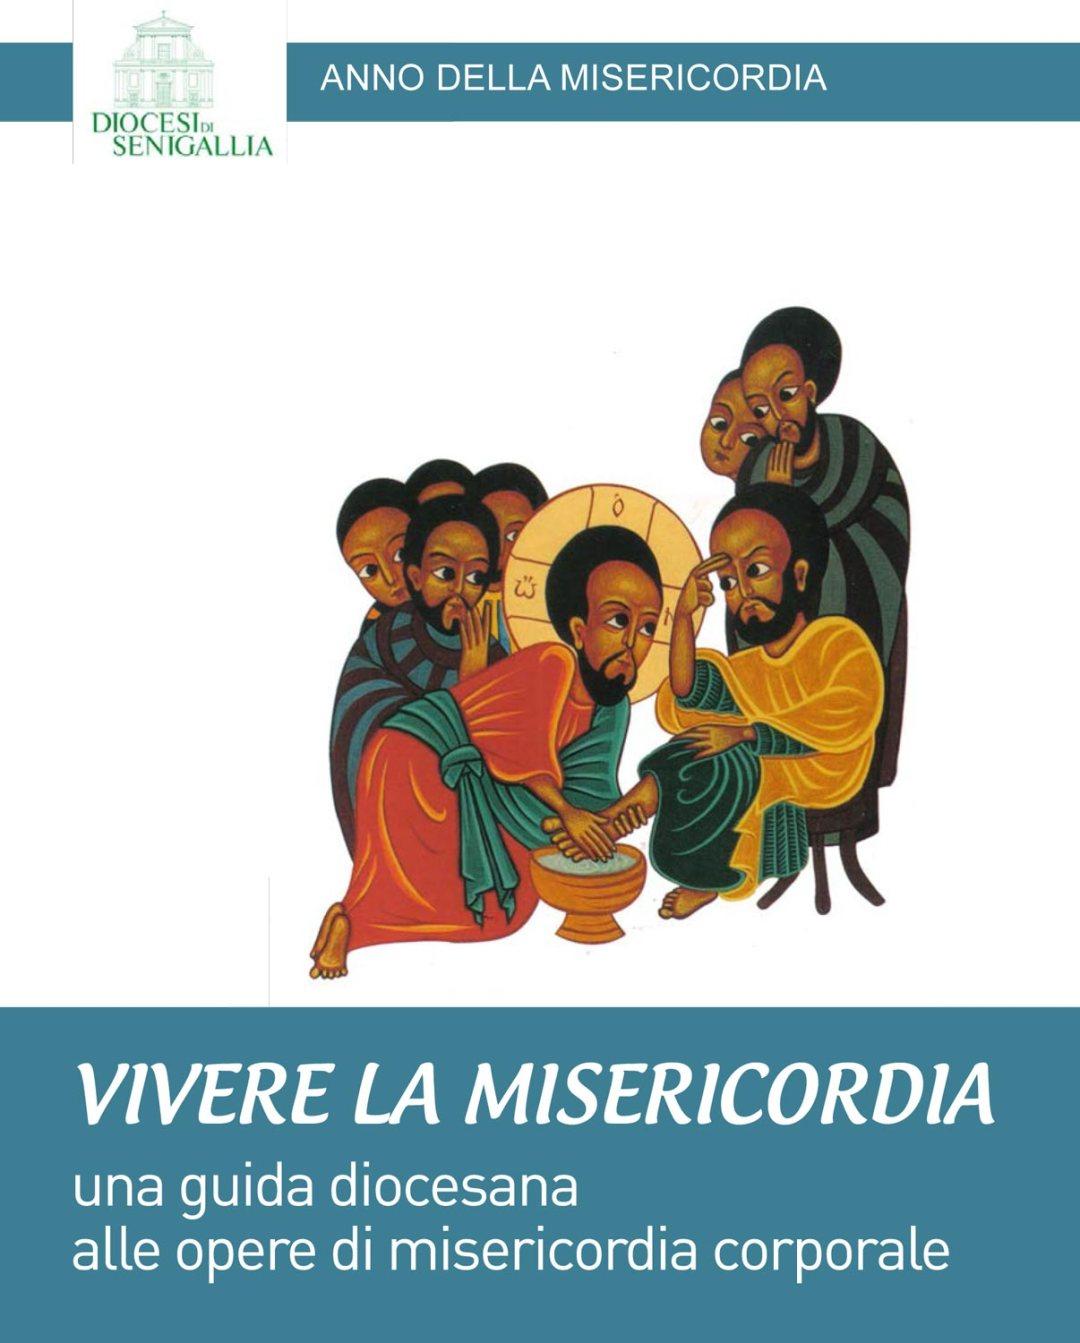 opere-misericordia-corporale-1